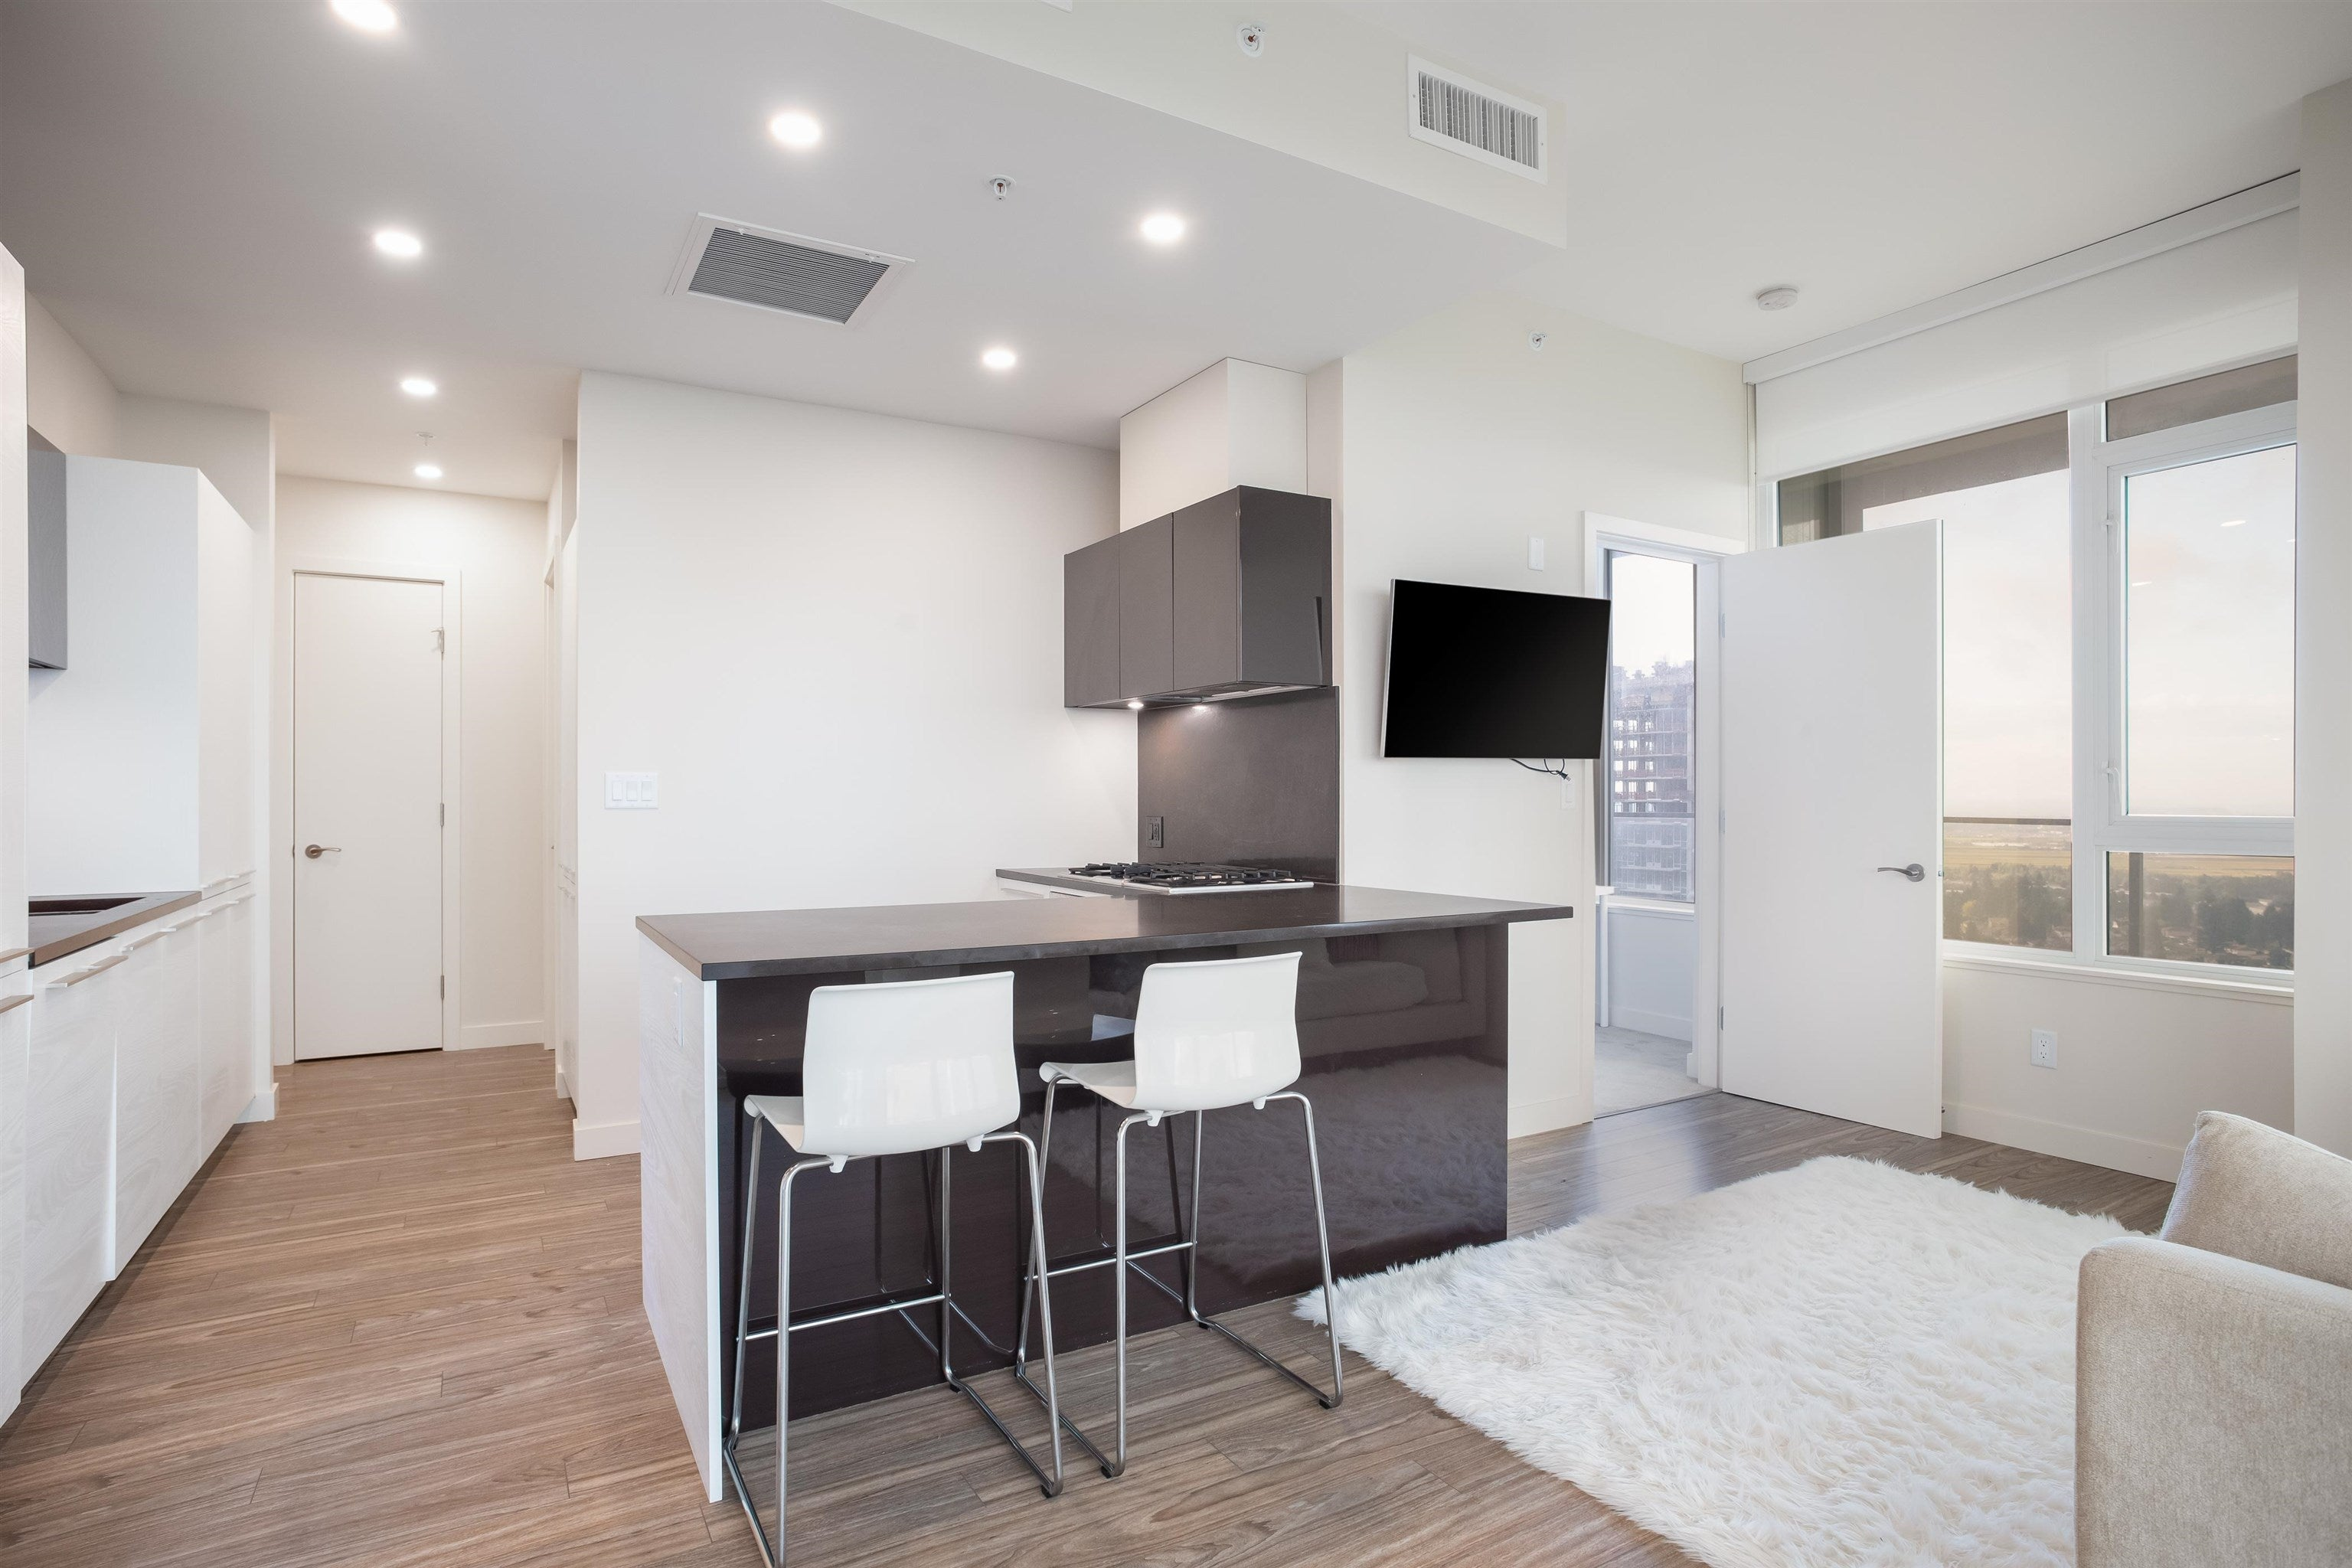 2206 6383 MCKAY AVENUE - Metrotown Apartment/Condo for sale, 2 Bedrooms (R2625647) - #7